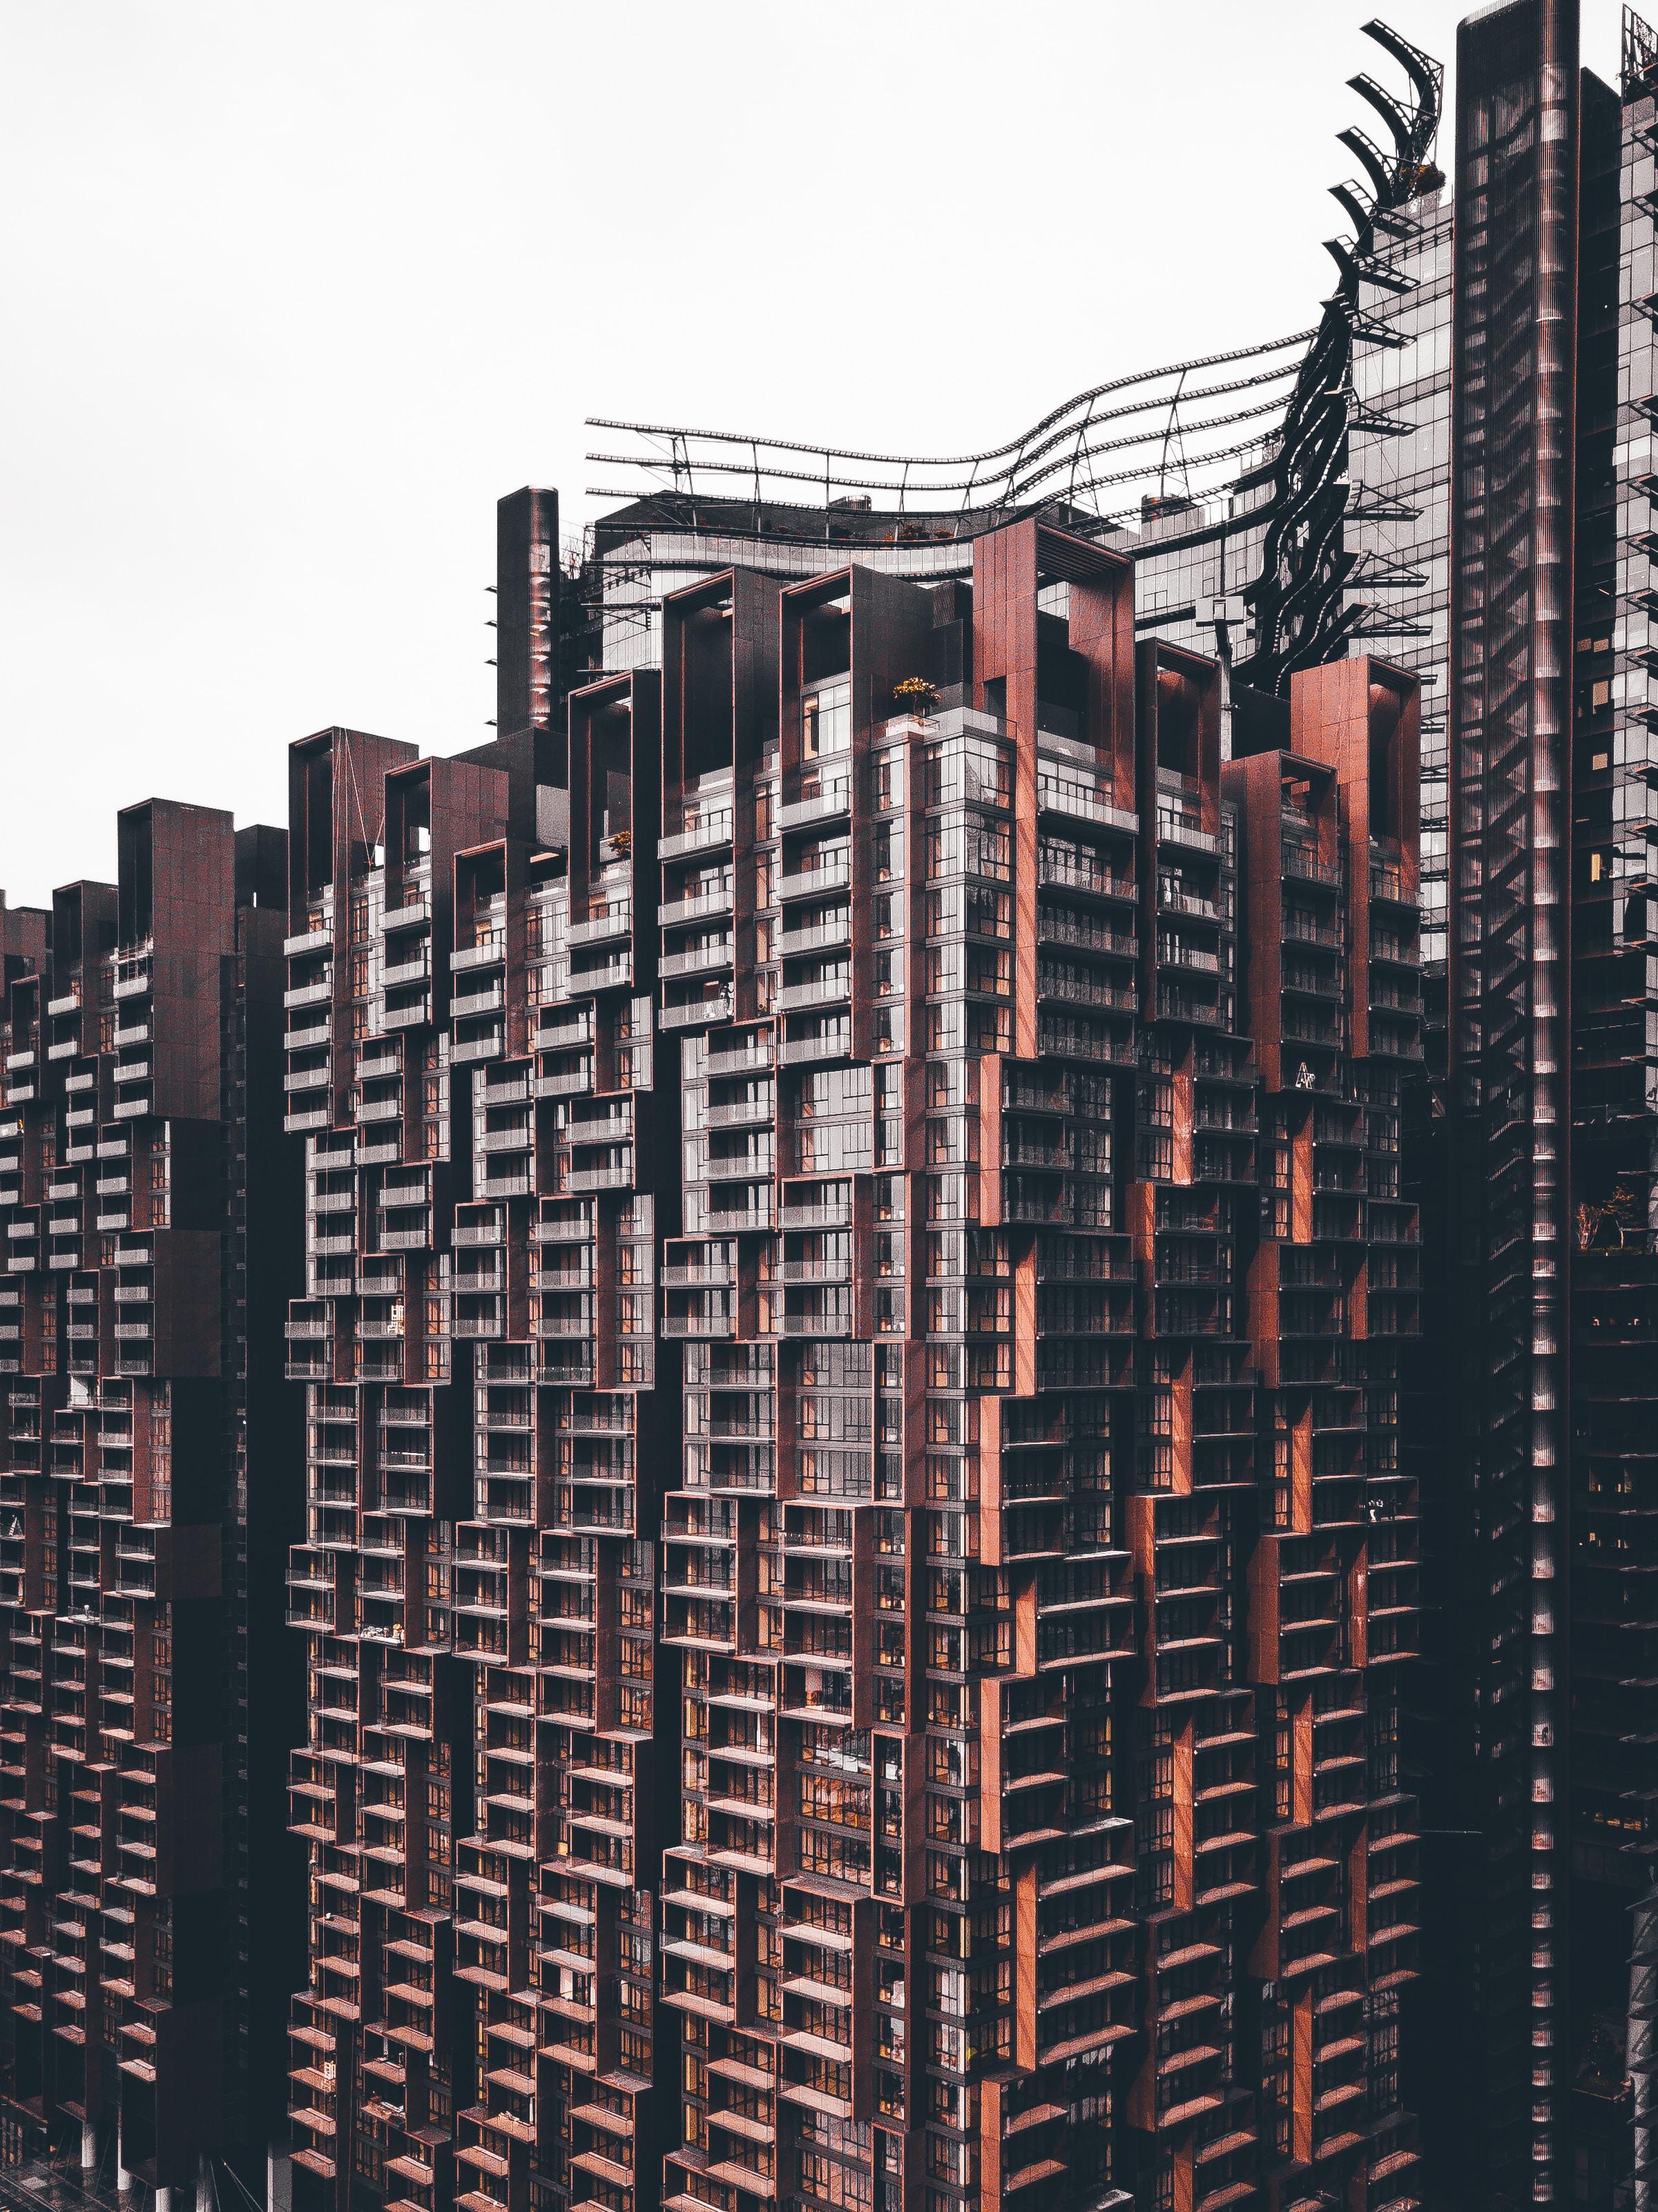 landscape photo of multi-storey building